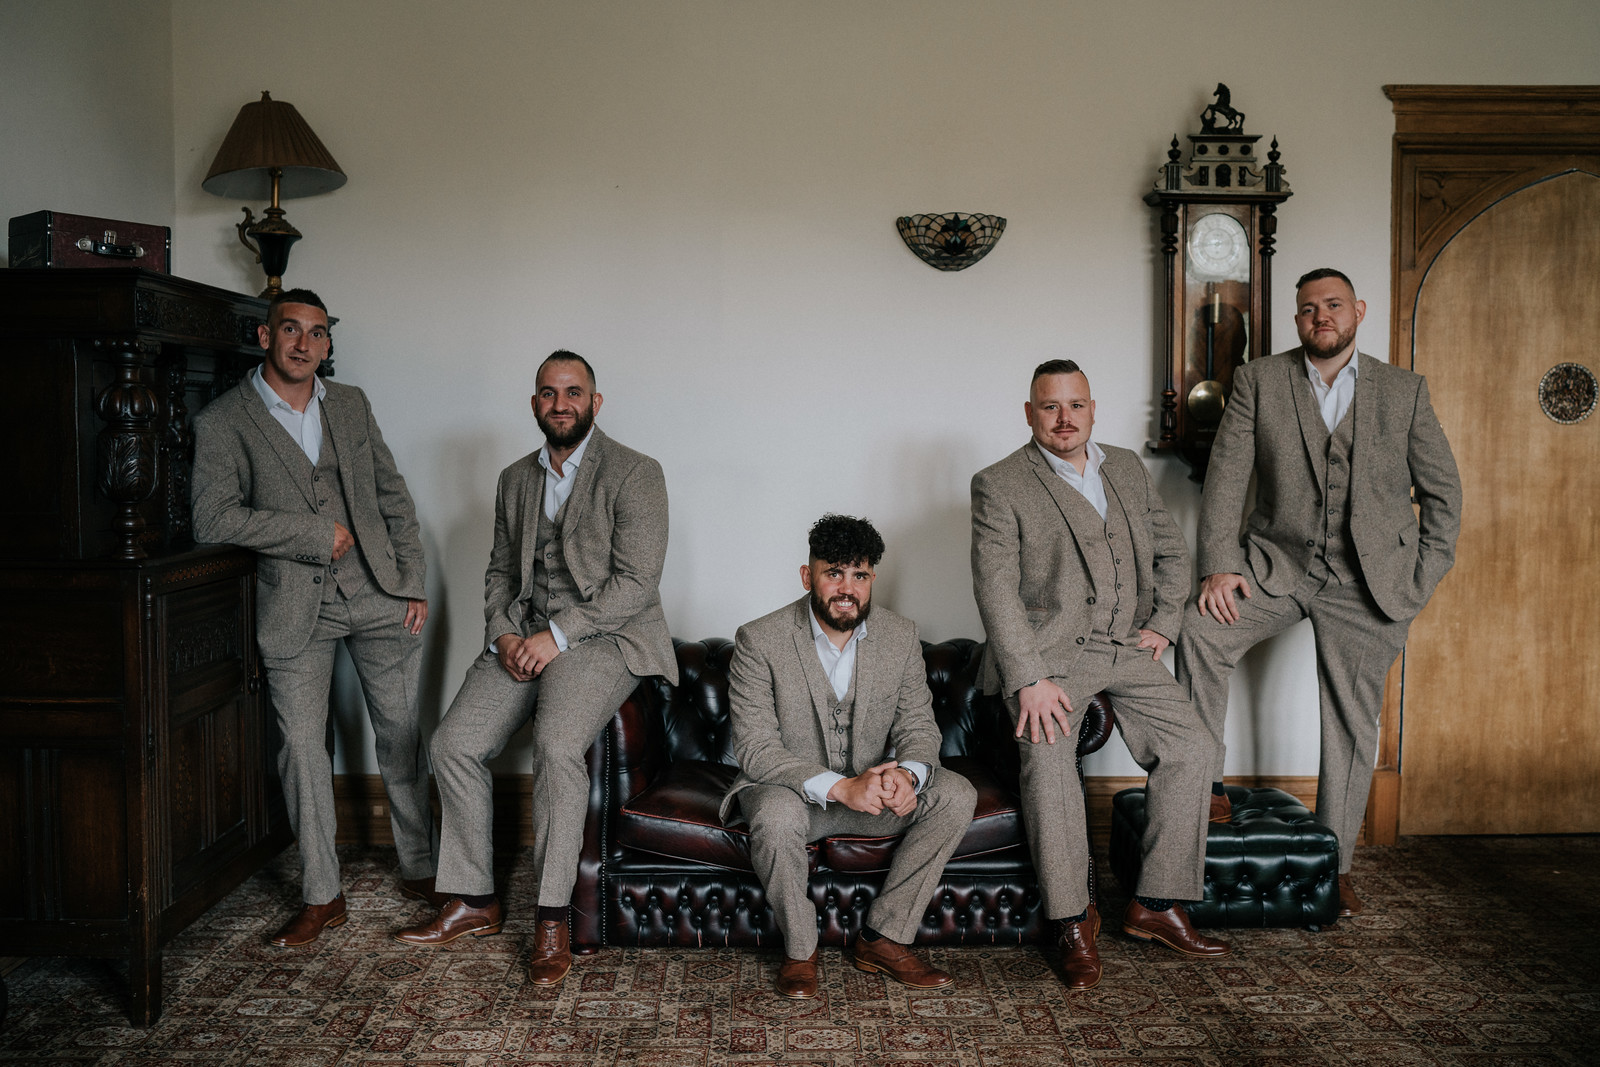 Groomsmen Wedding Photo - Vintage Style Wedding